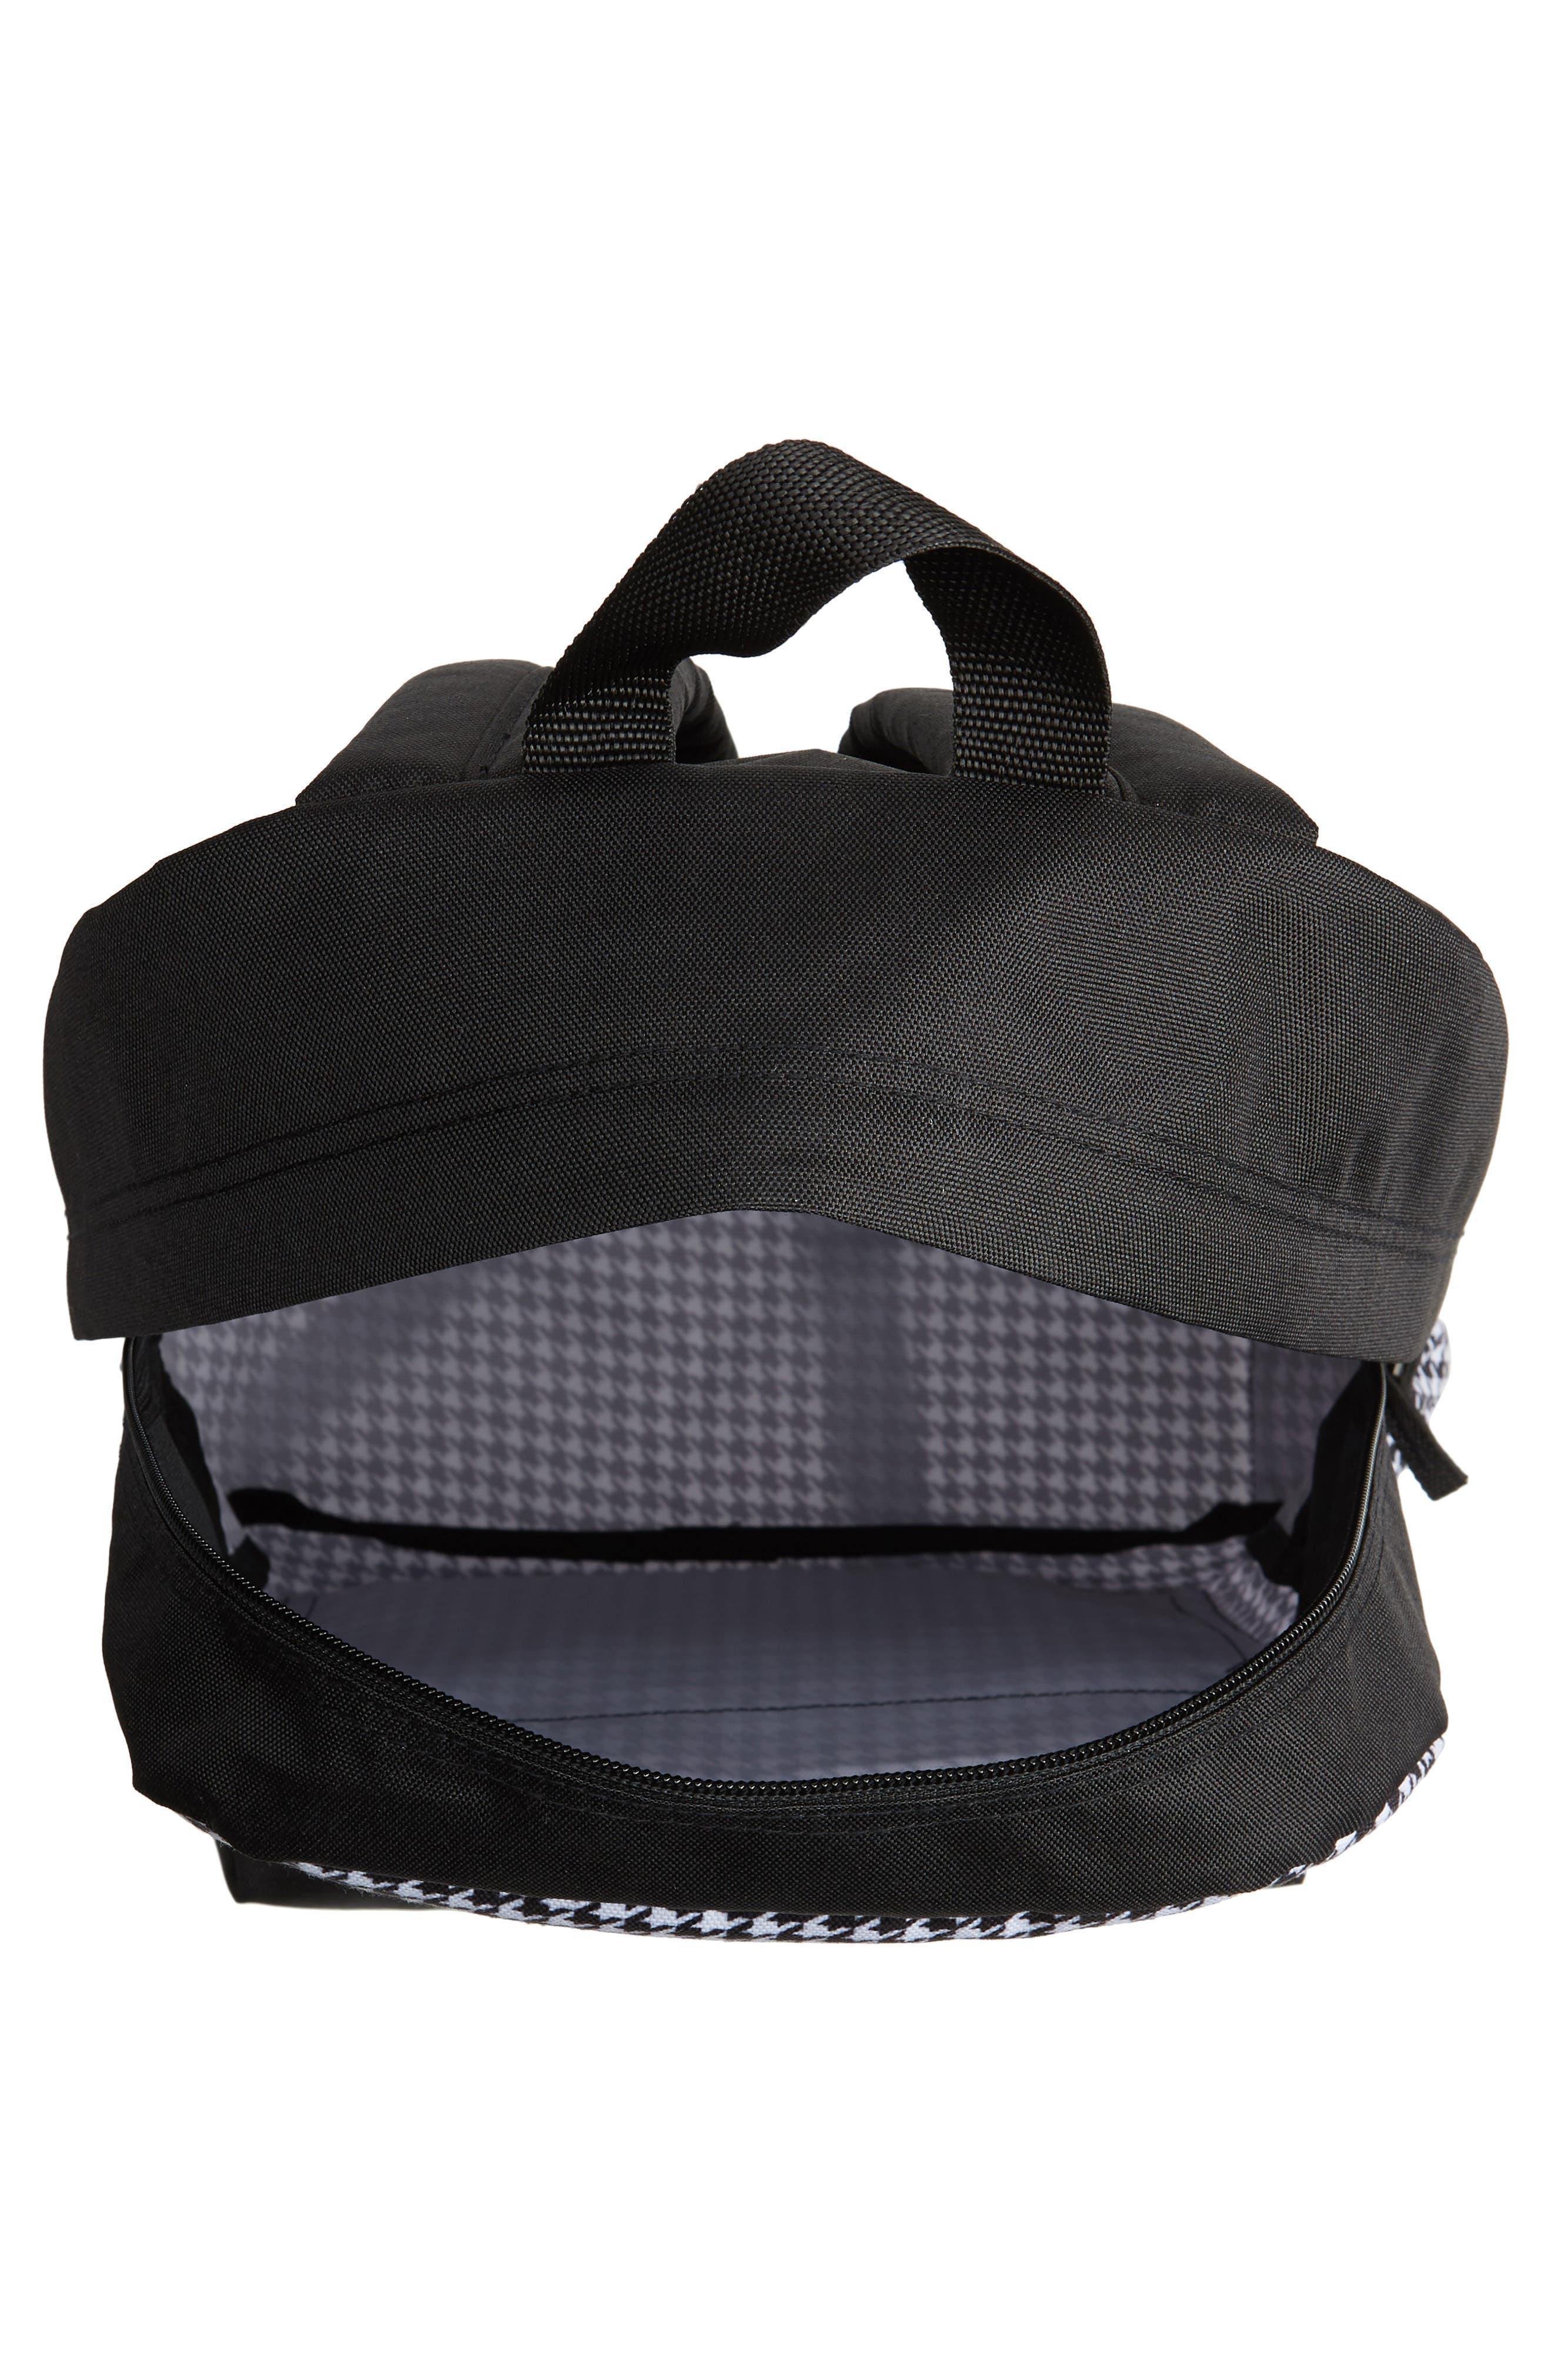 Realm Flying V Backpack,                             Alternate thumbnail 4, color,                             001